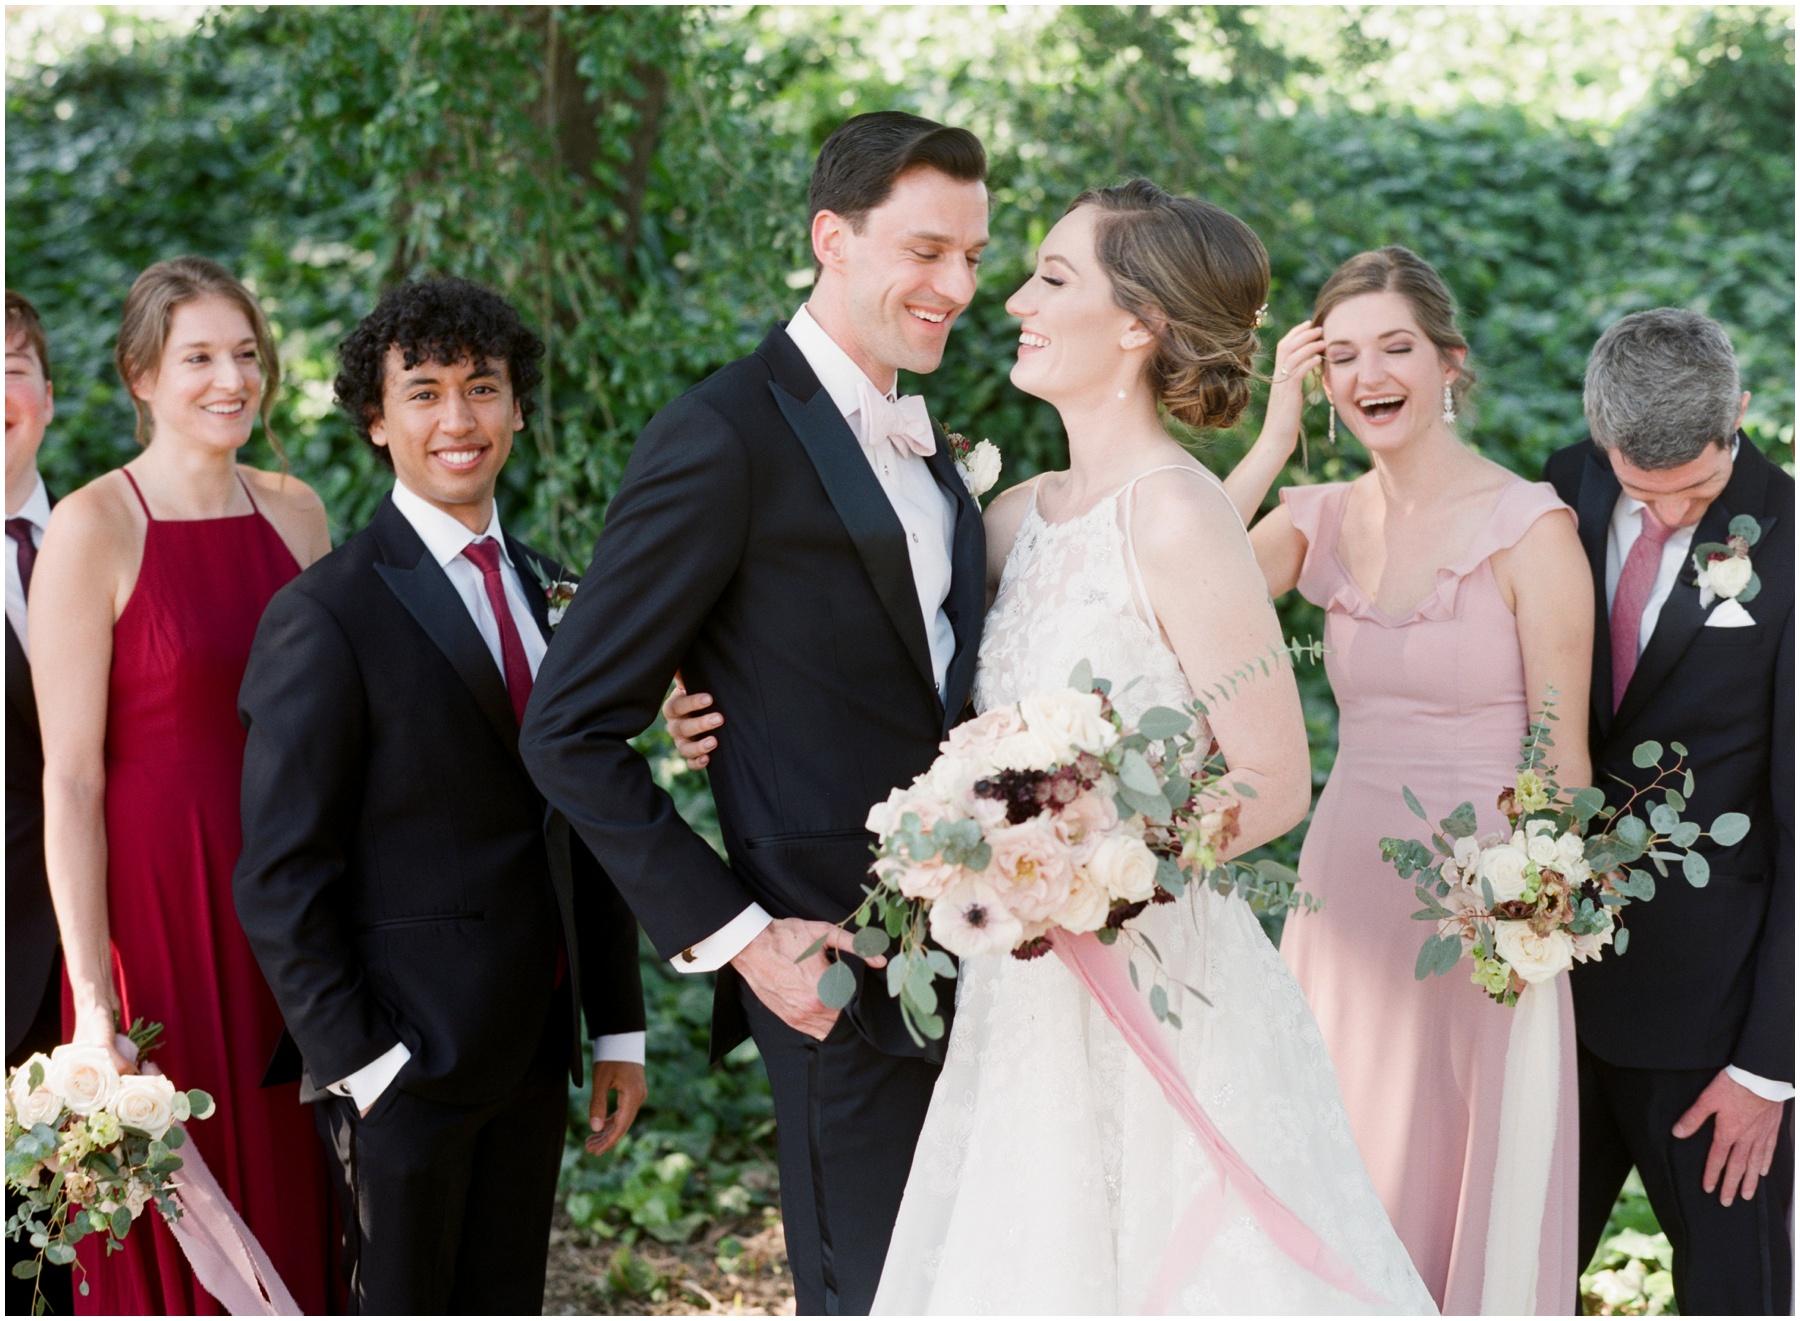 Scribner-bend-vineyards-wedding-sacramento-california-Kristine-Herman-Photography-91.jpg